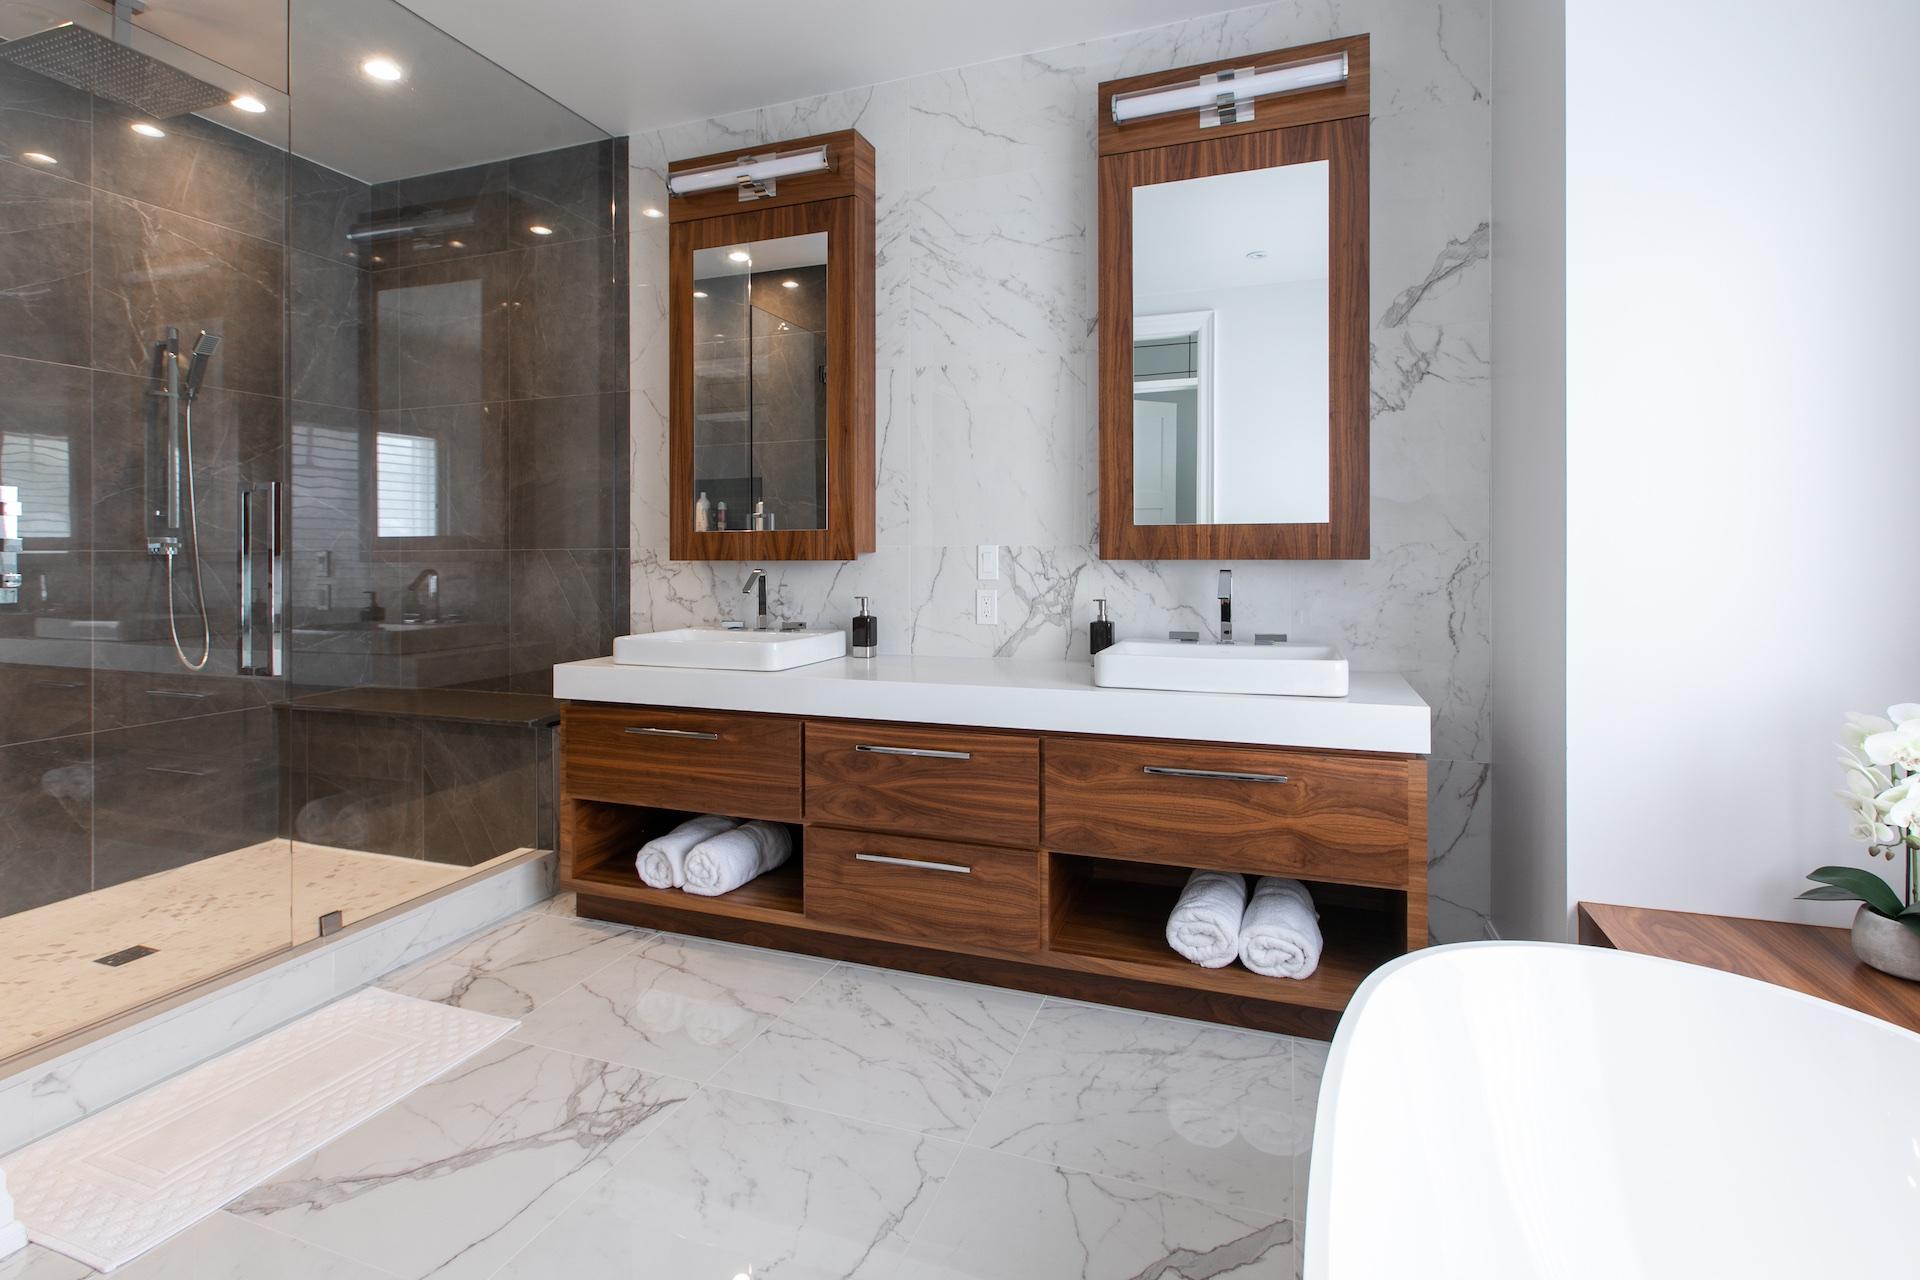 Double wood vanity with marble floors